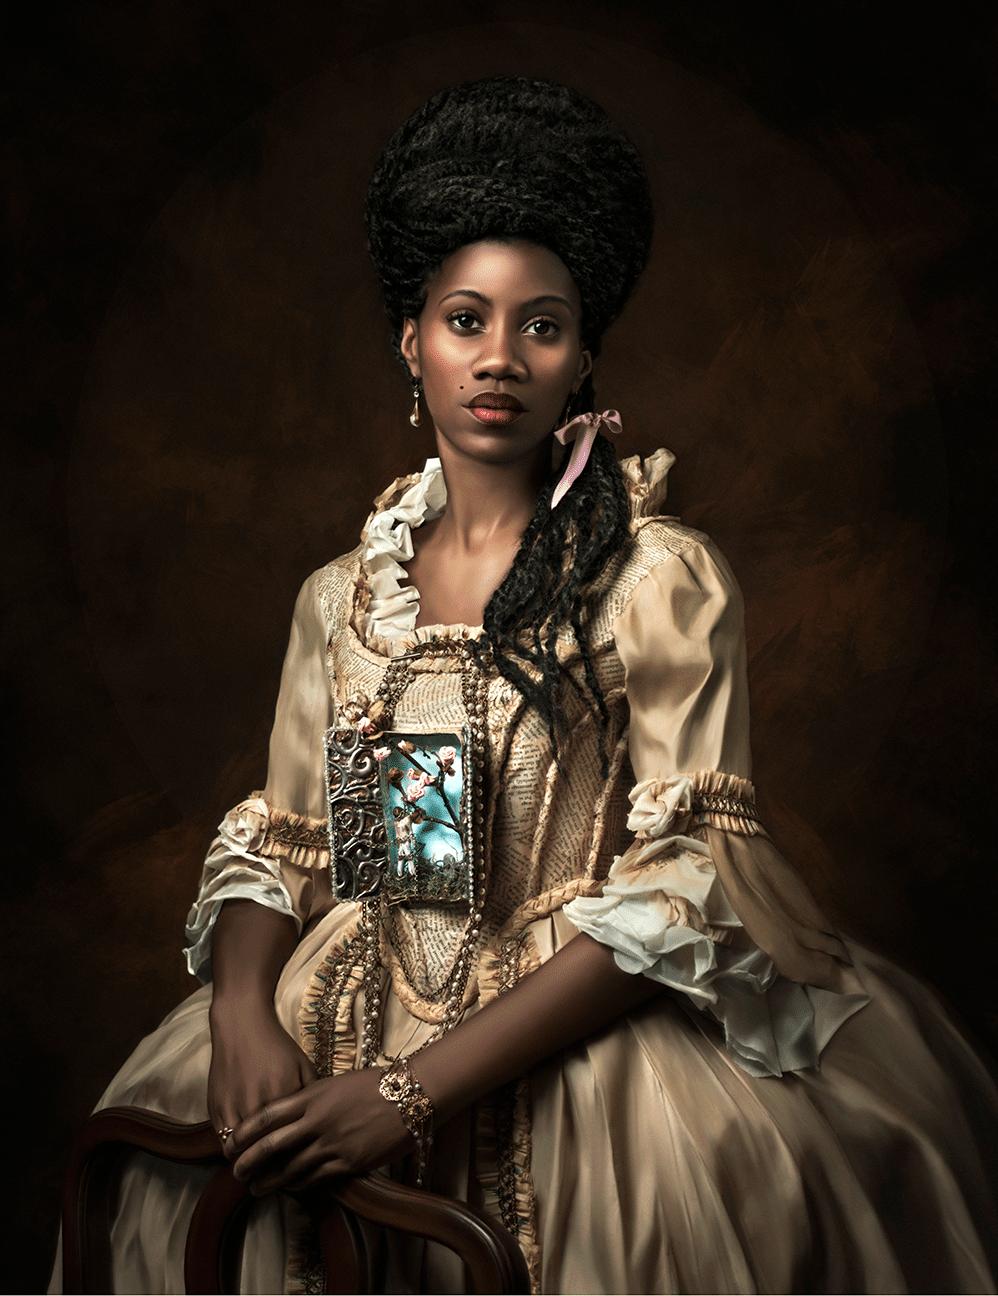 Rewriting History by Fabiola Jean-Louis